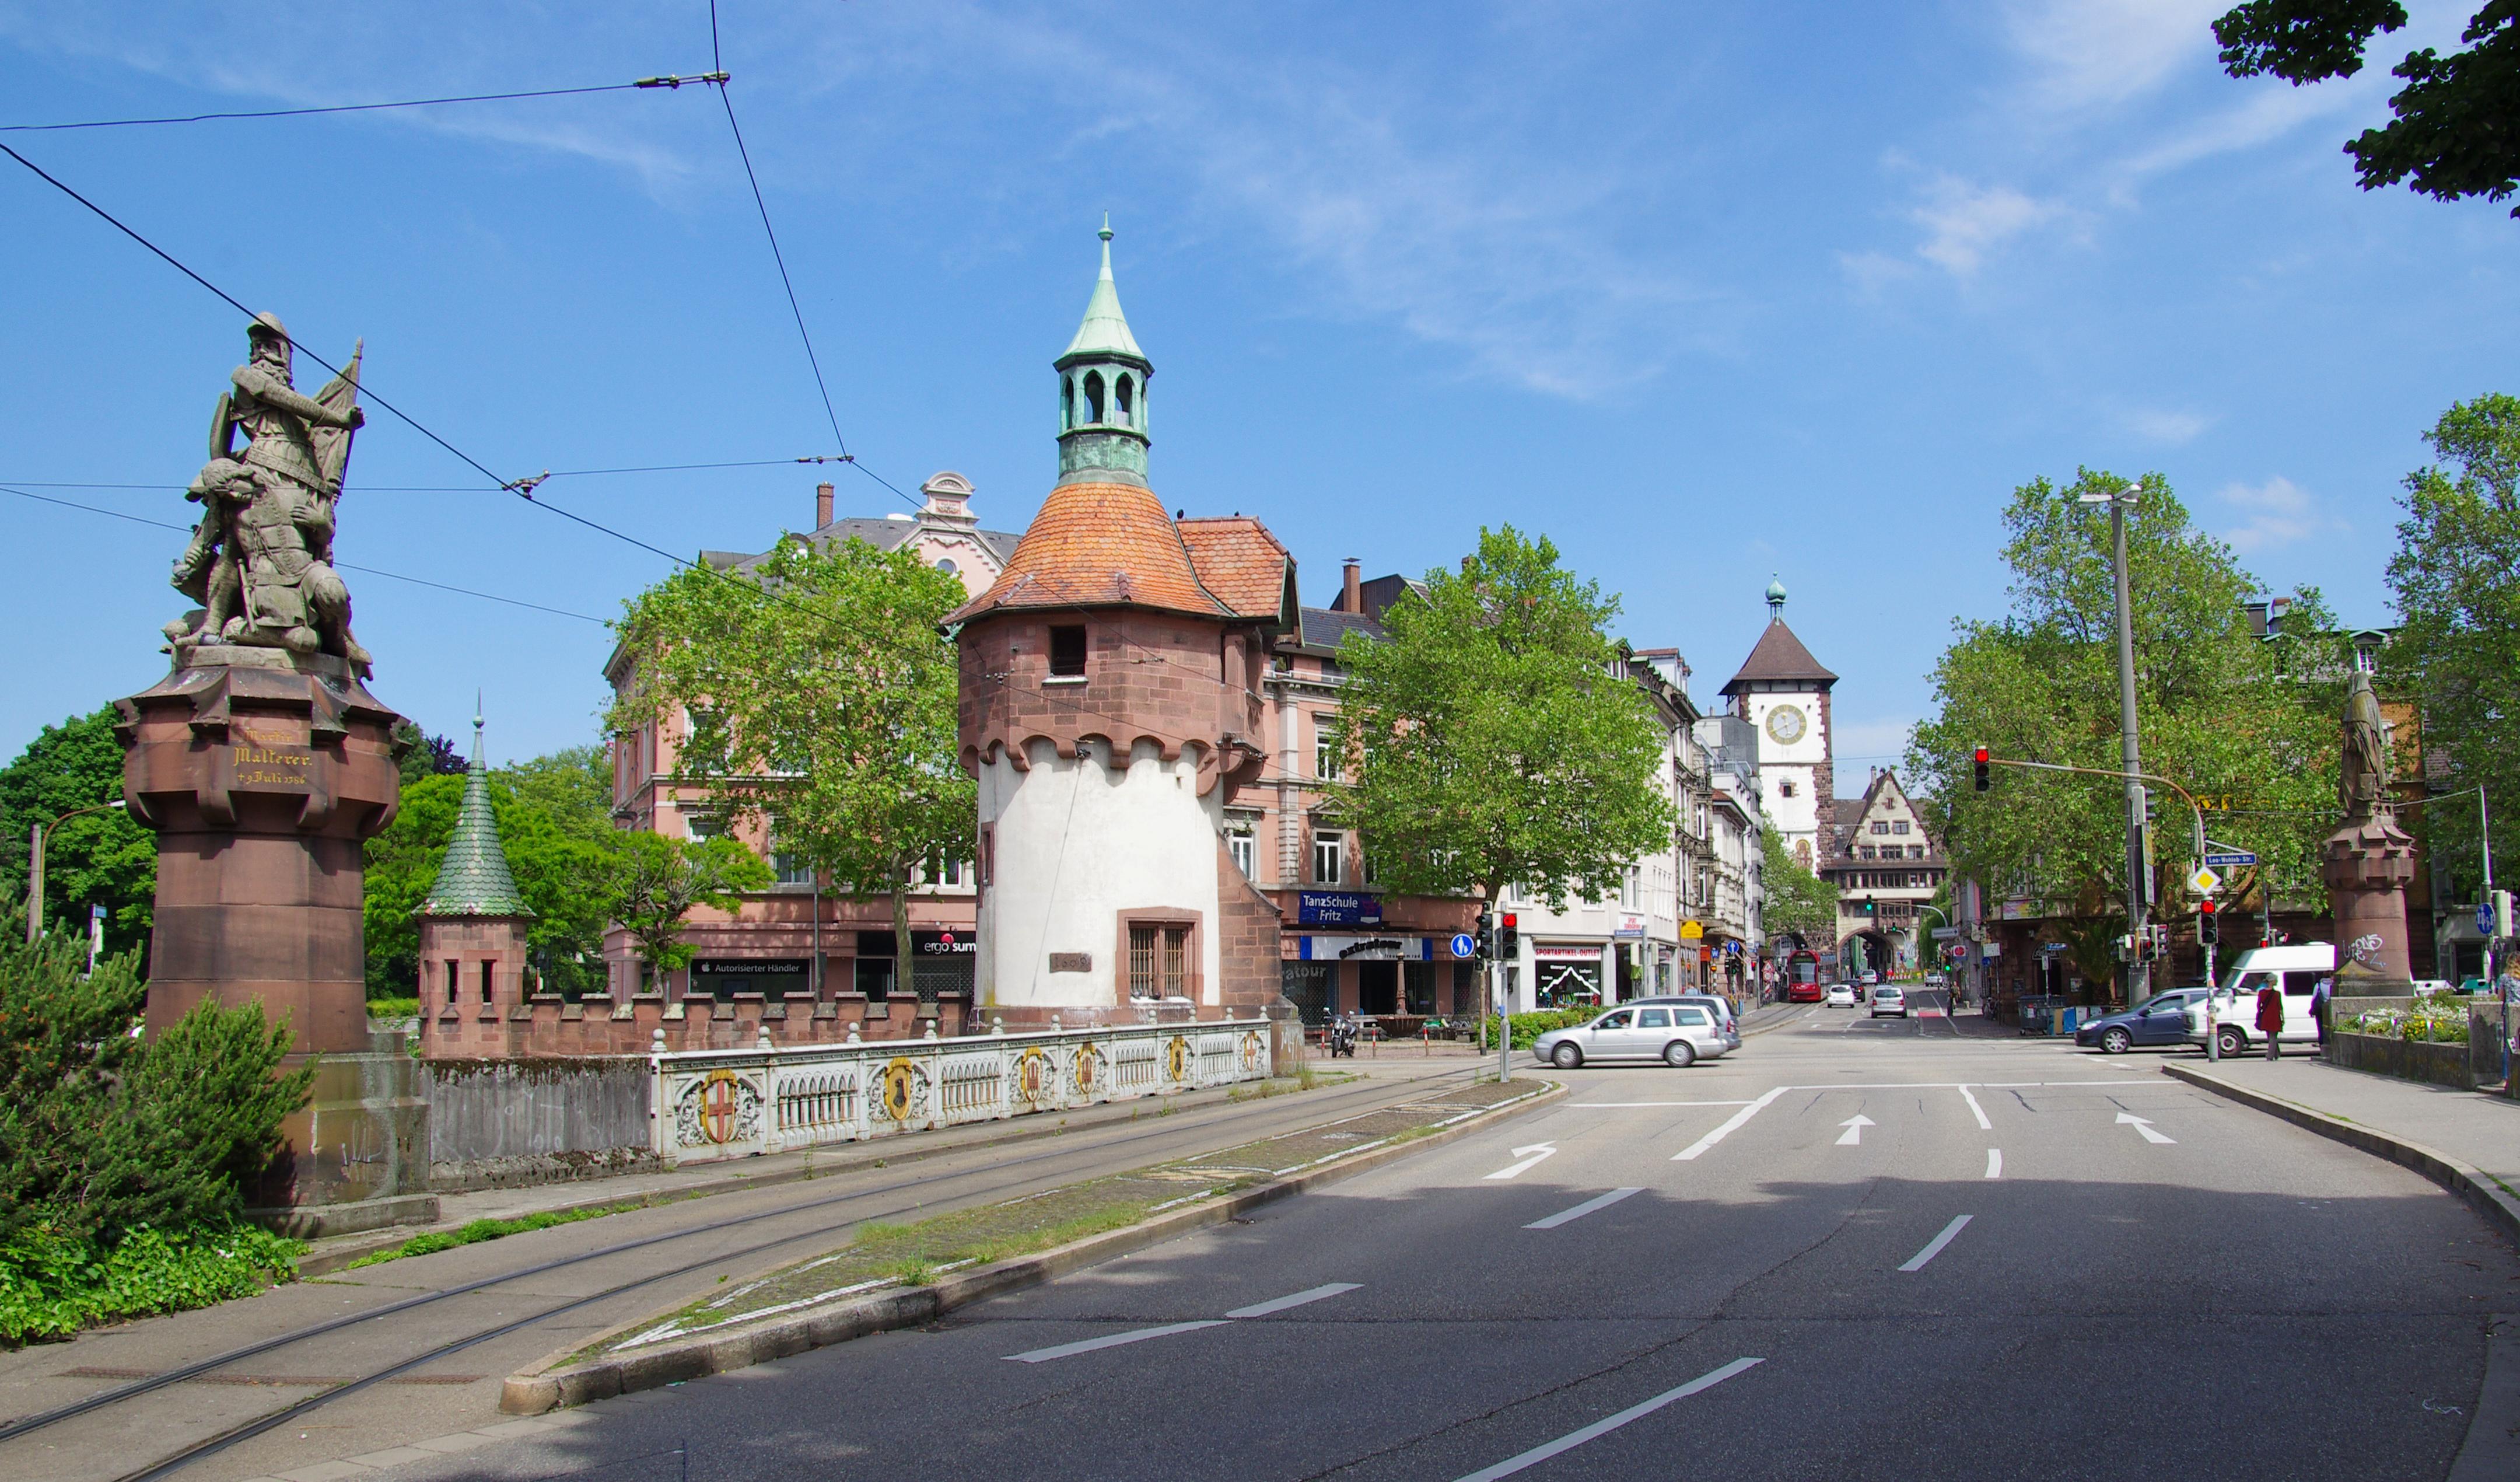 mail partnersuche singletreff freiburg in e im breisgau  Freiburg - Face-to-Face Dating.